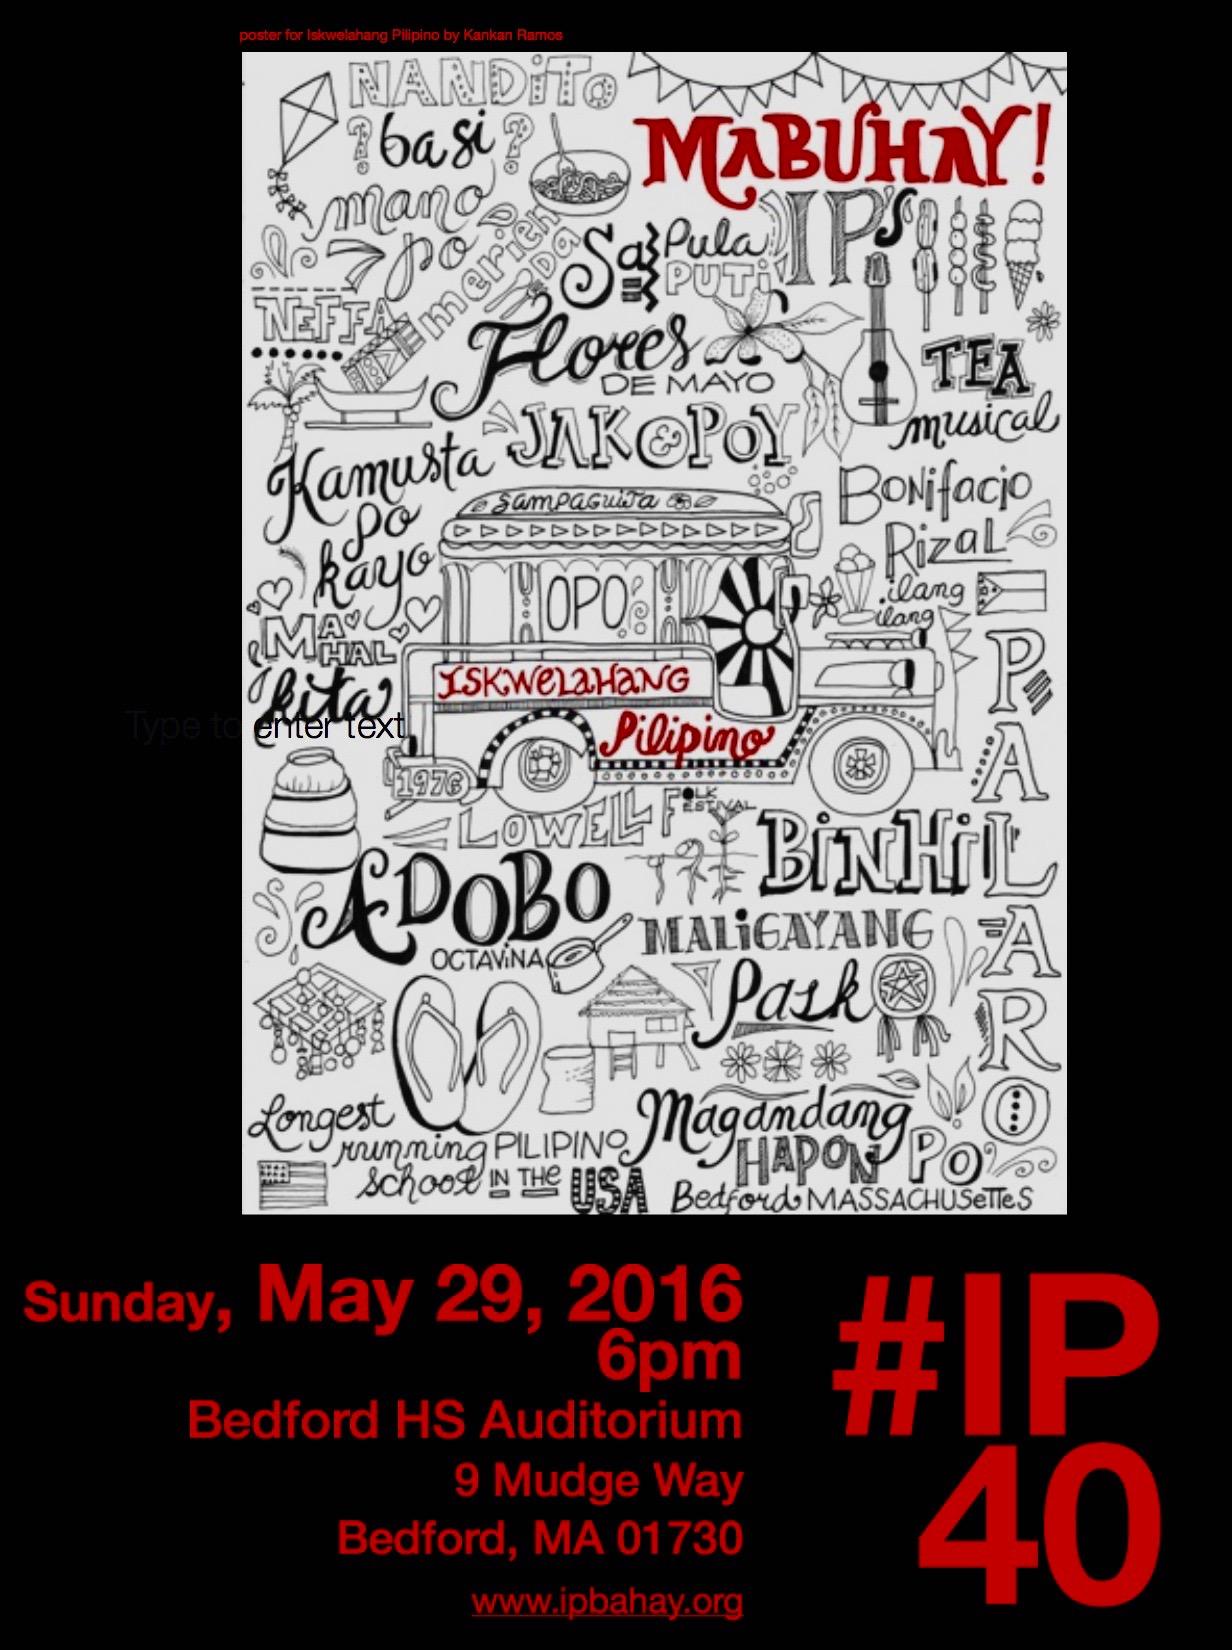 #IP40 poster jpeg (1)